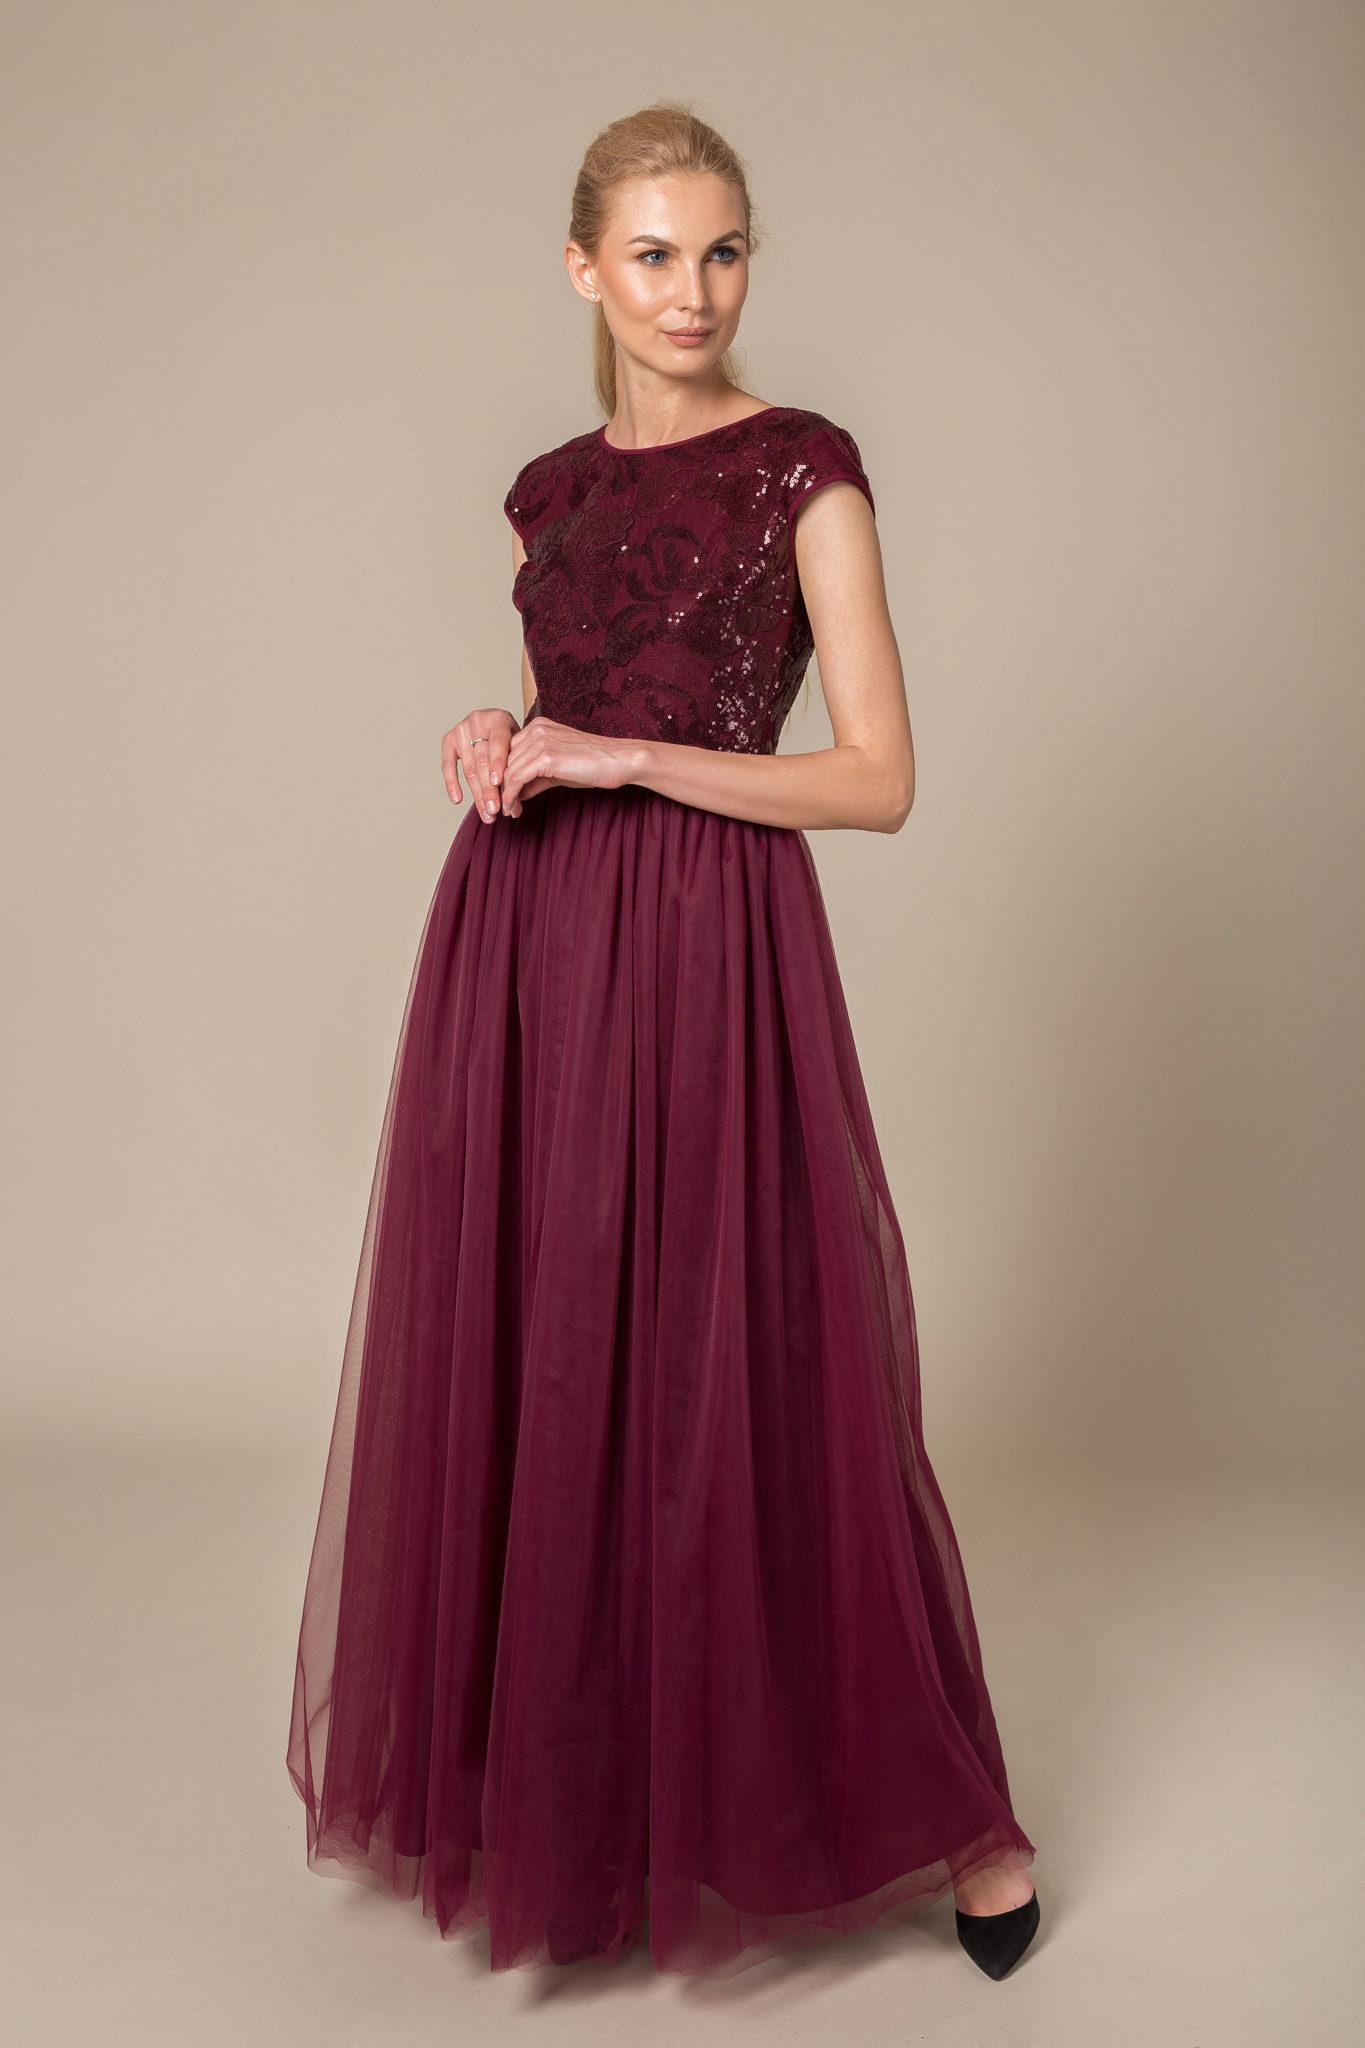 Burgundy sequin & tulle evening dress